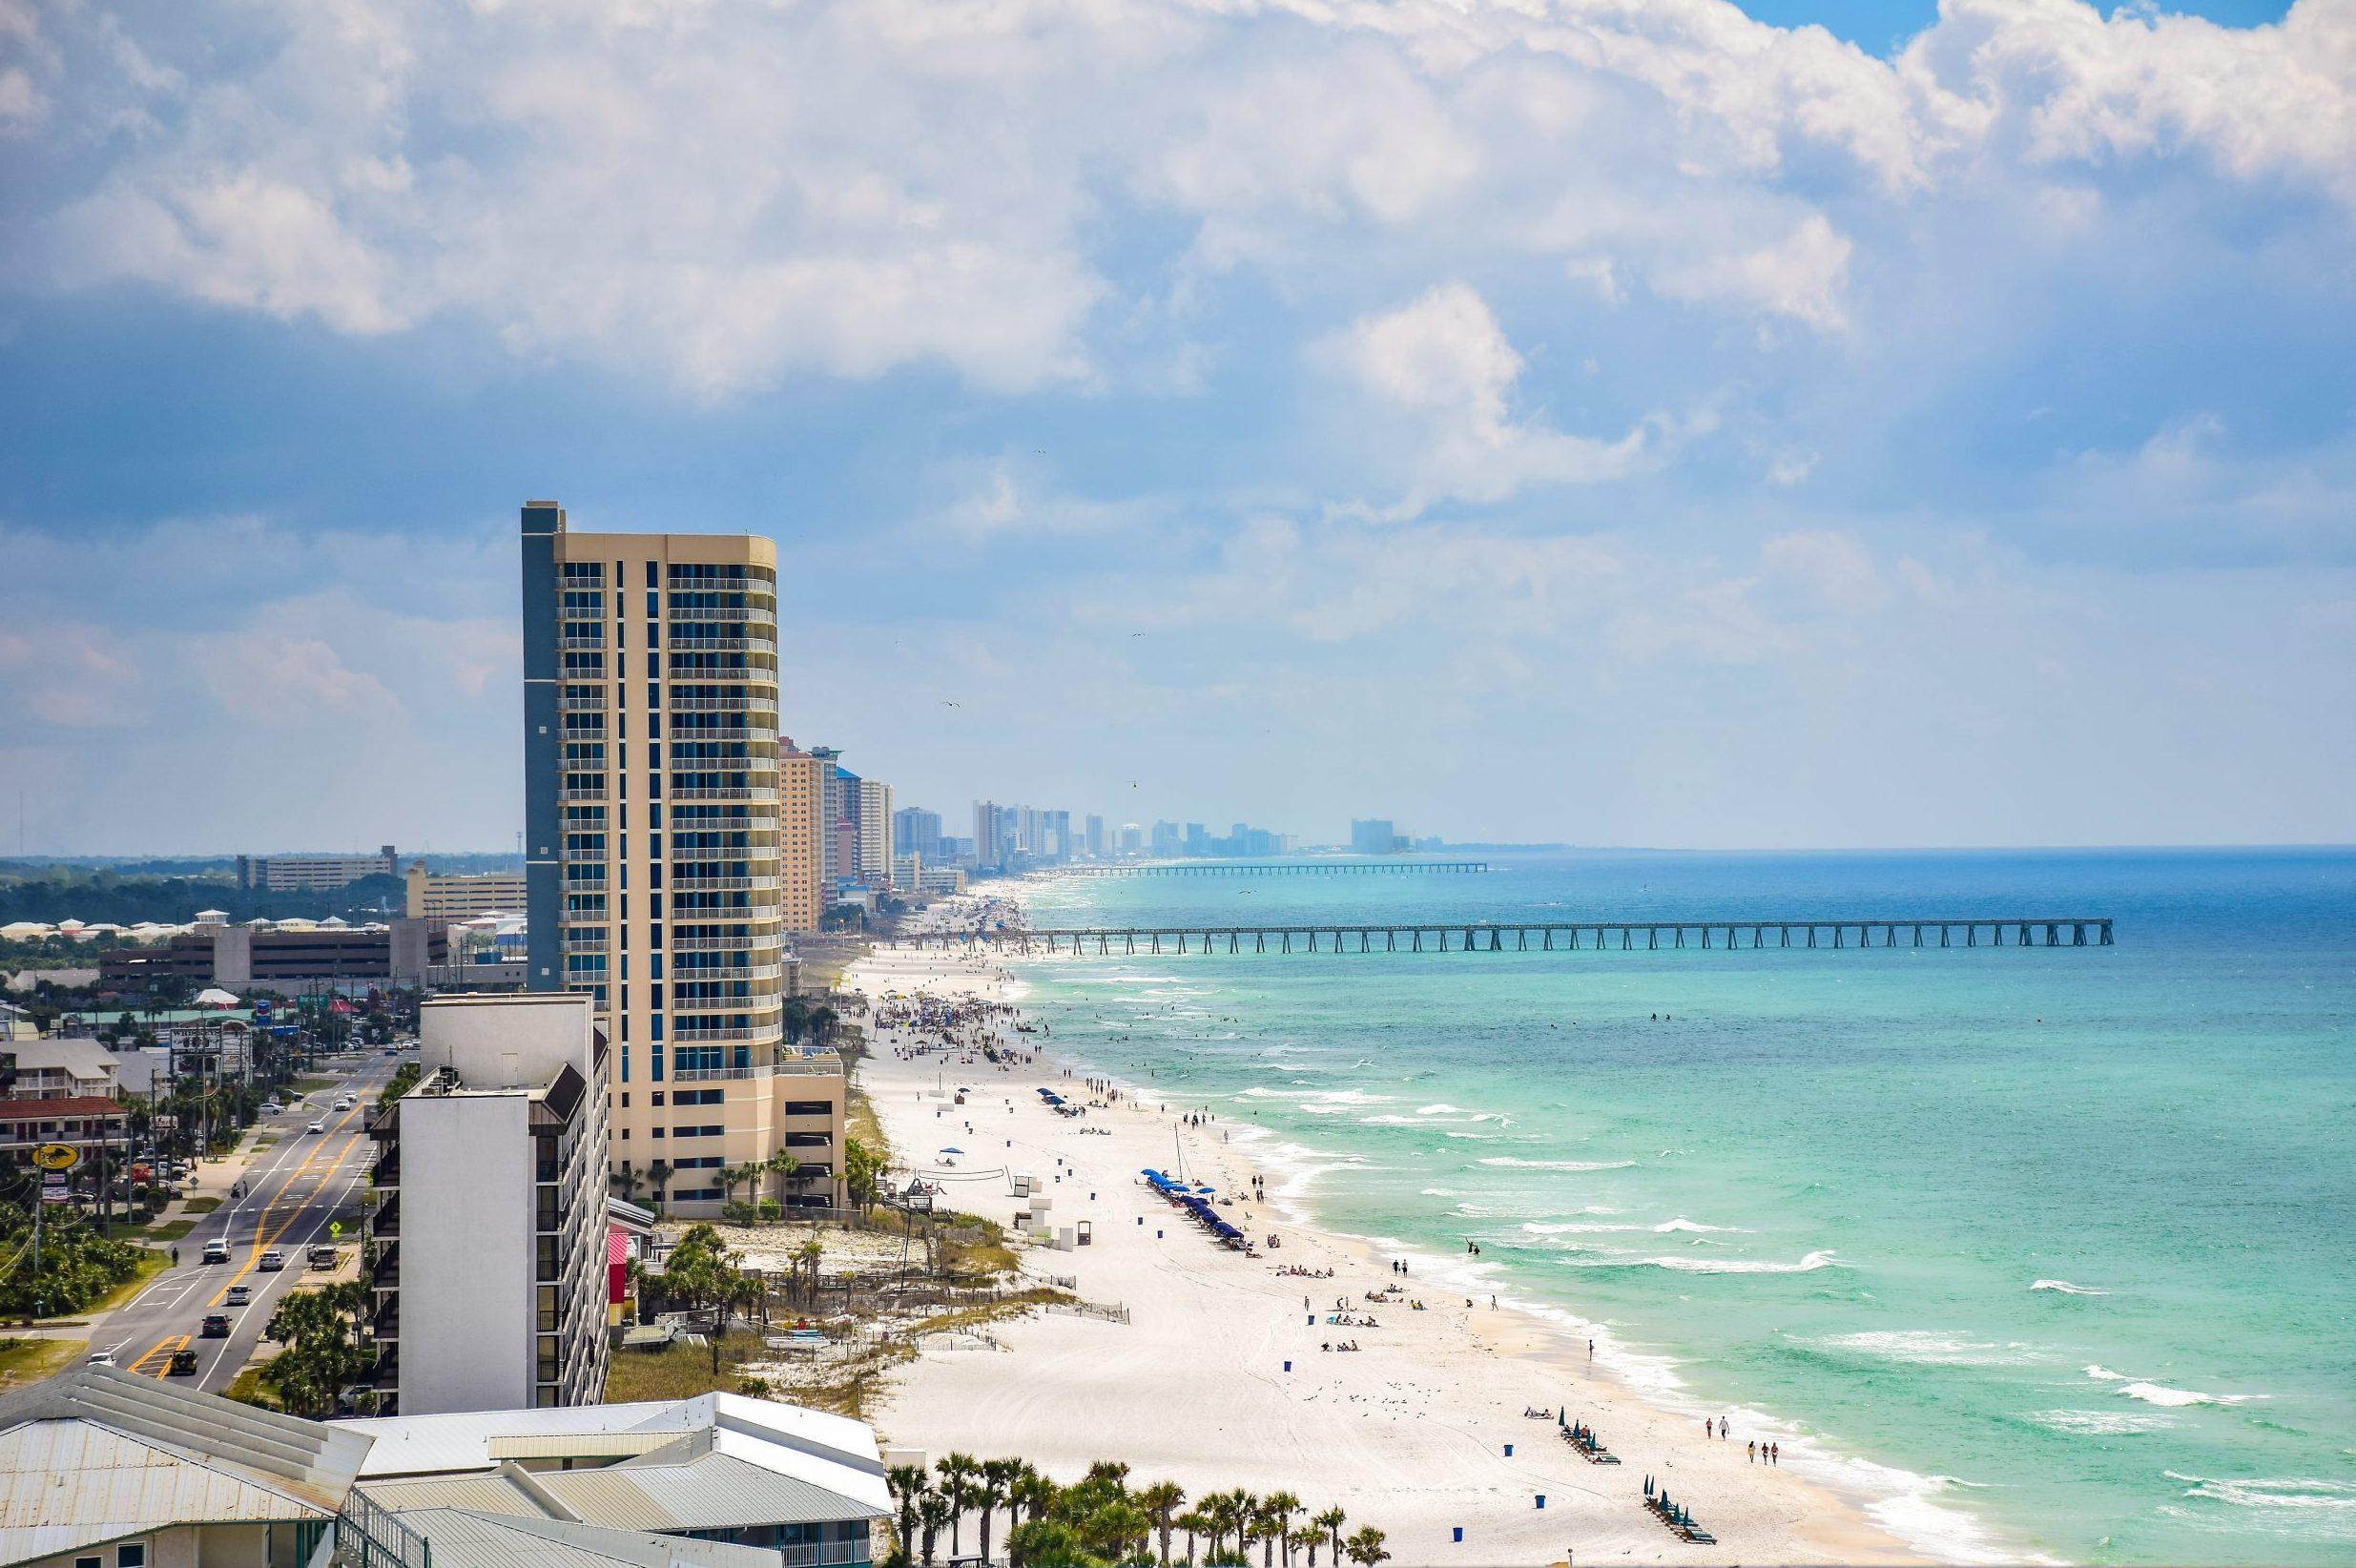 Drone Aerial Beach View of Panama City Beach, Florida, USA